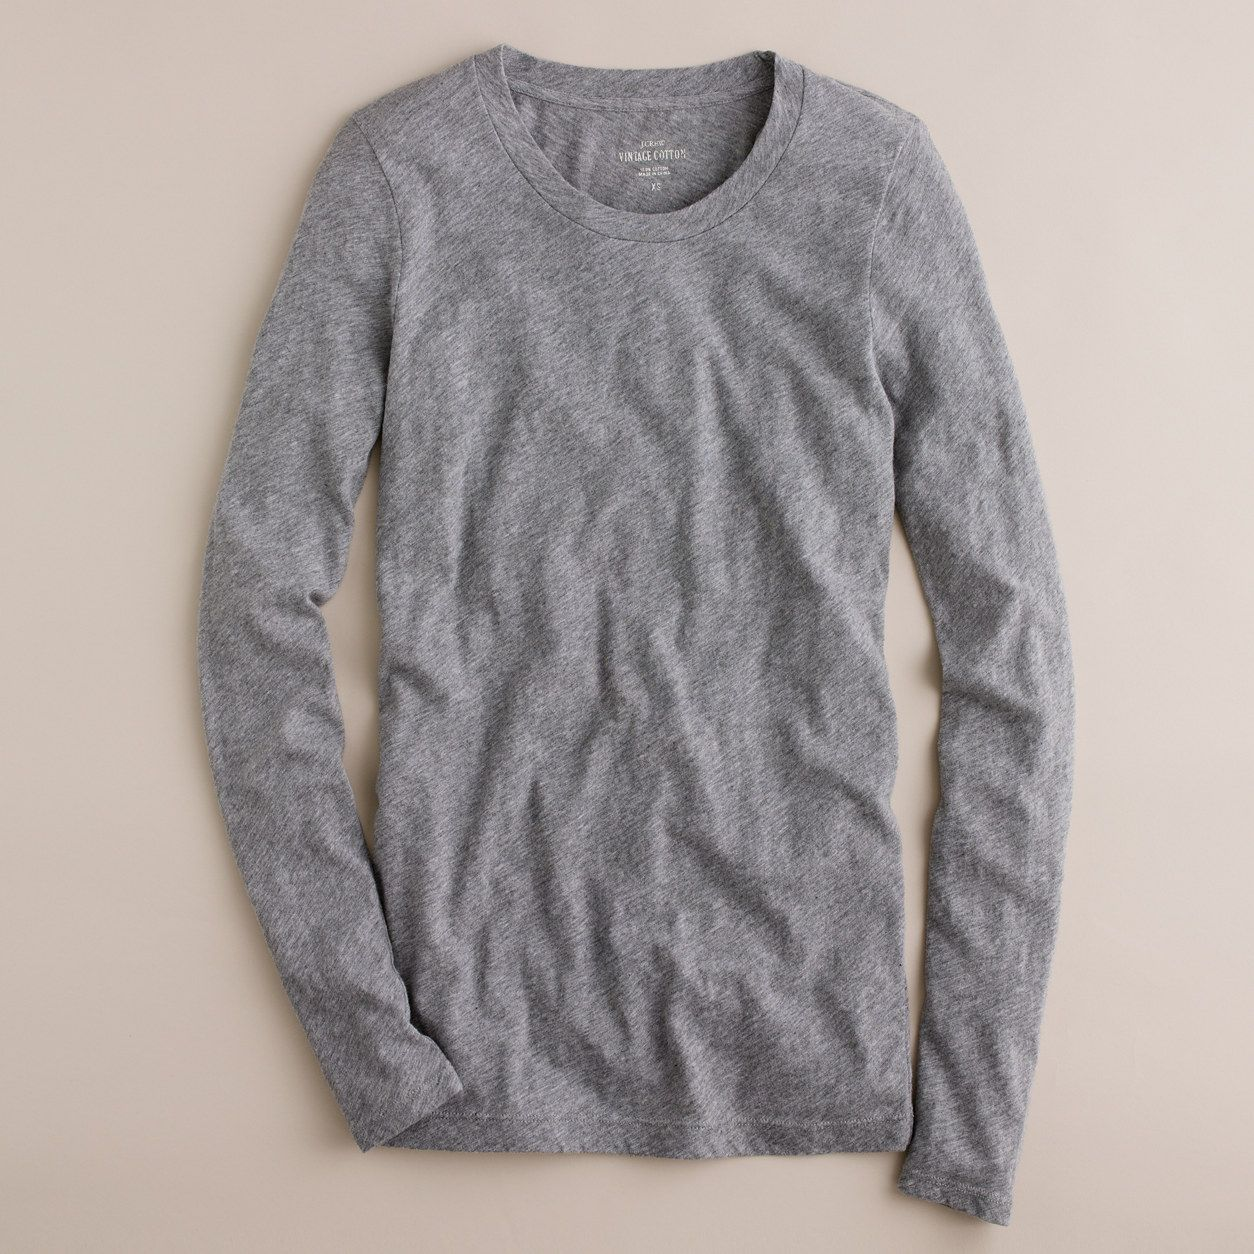 Jcrew womens vintage cotton longsleeve tshirt size products